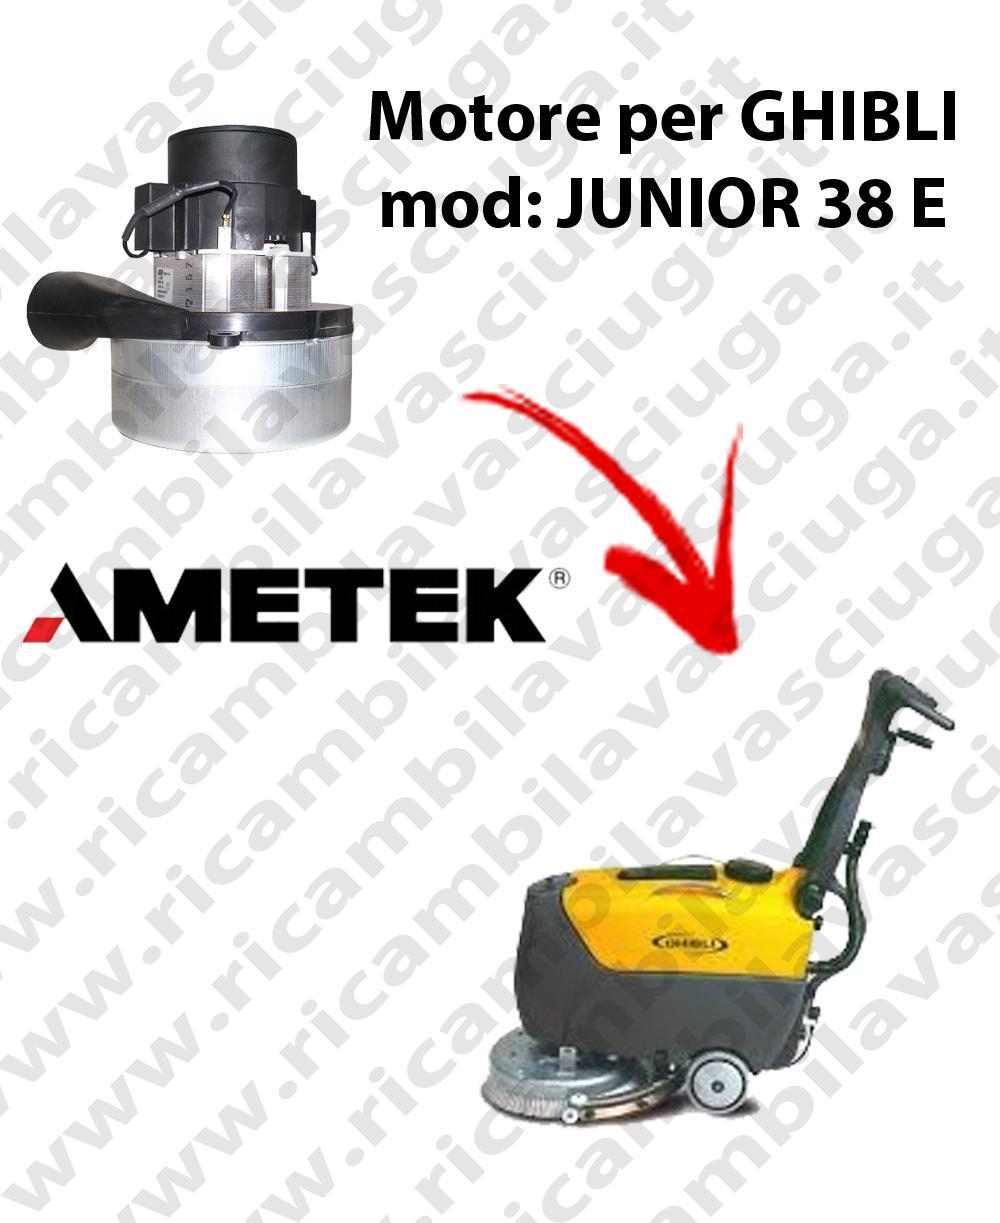 JUNIOR 38 E Vacuum motor SY NCLEAN for scrubber dryer GHIBLI